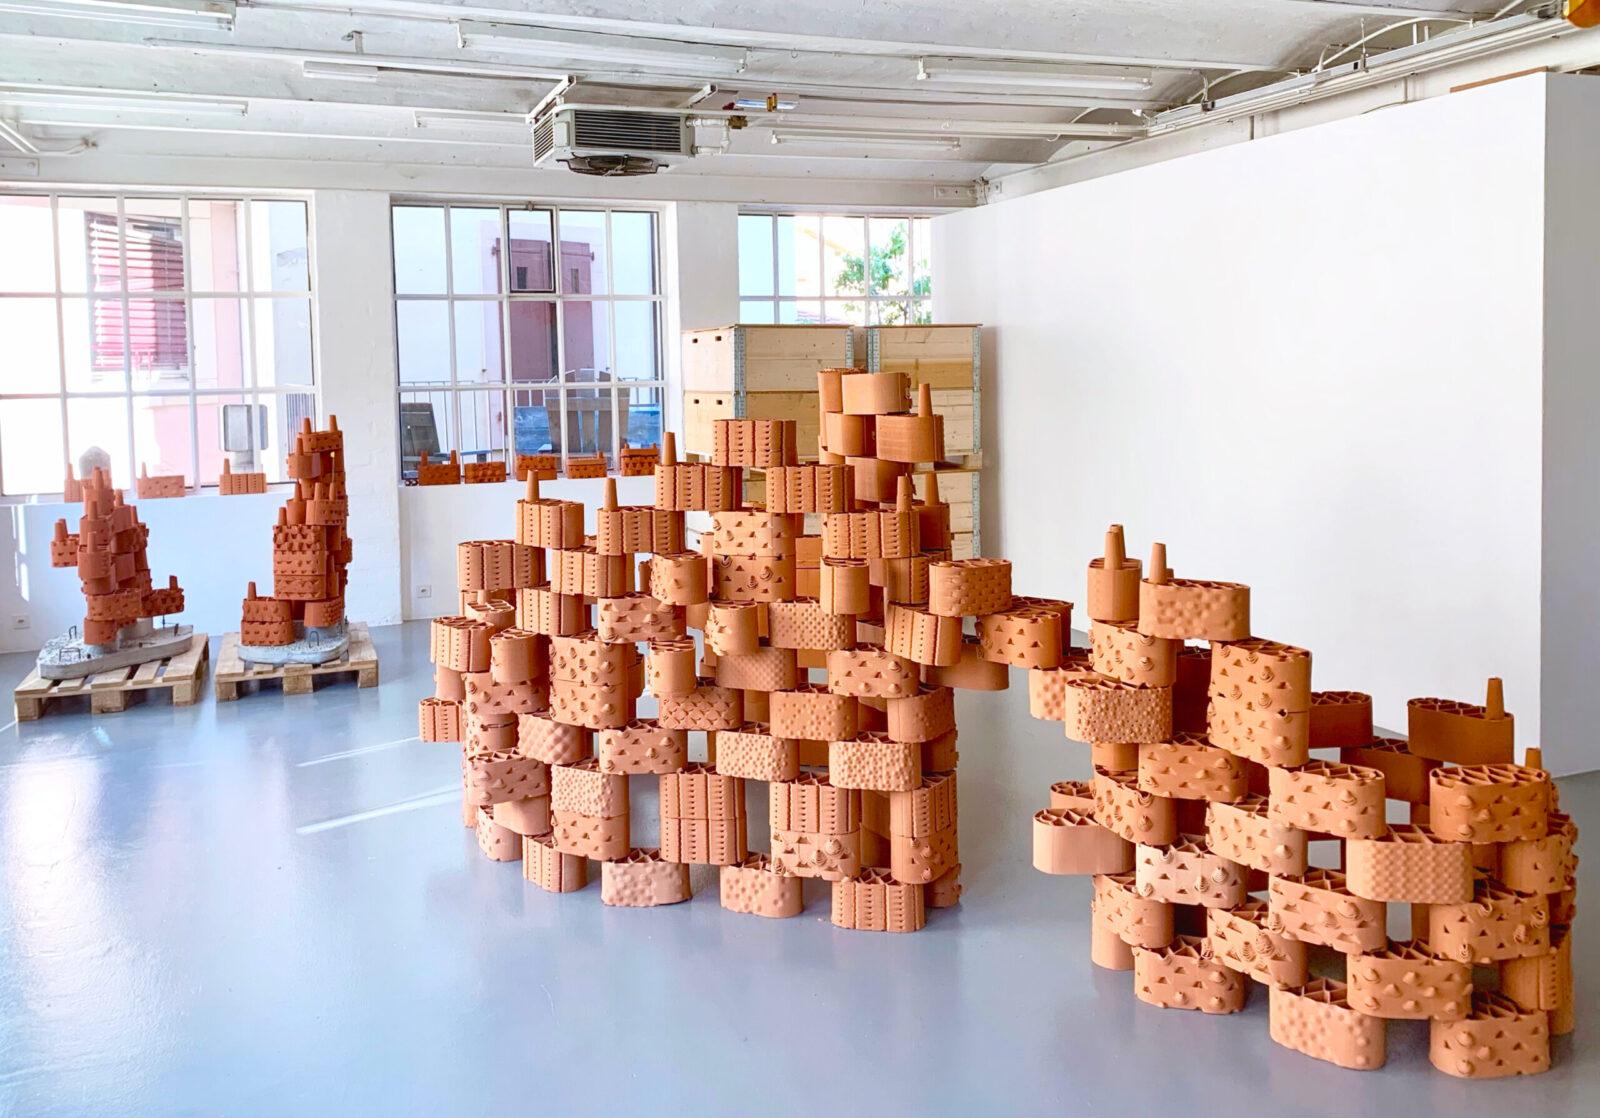 Ready produced clay prototypes. © Marie Griesmar/rrreefs